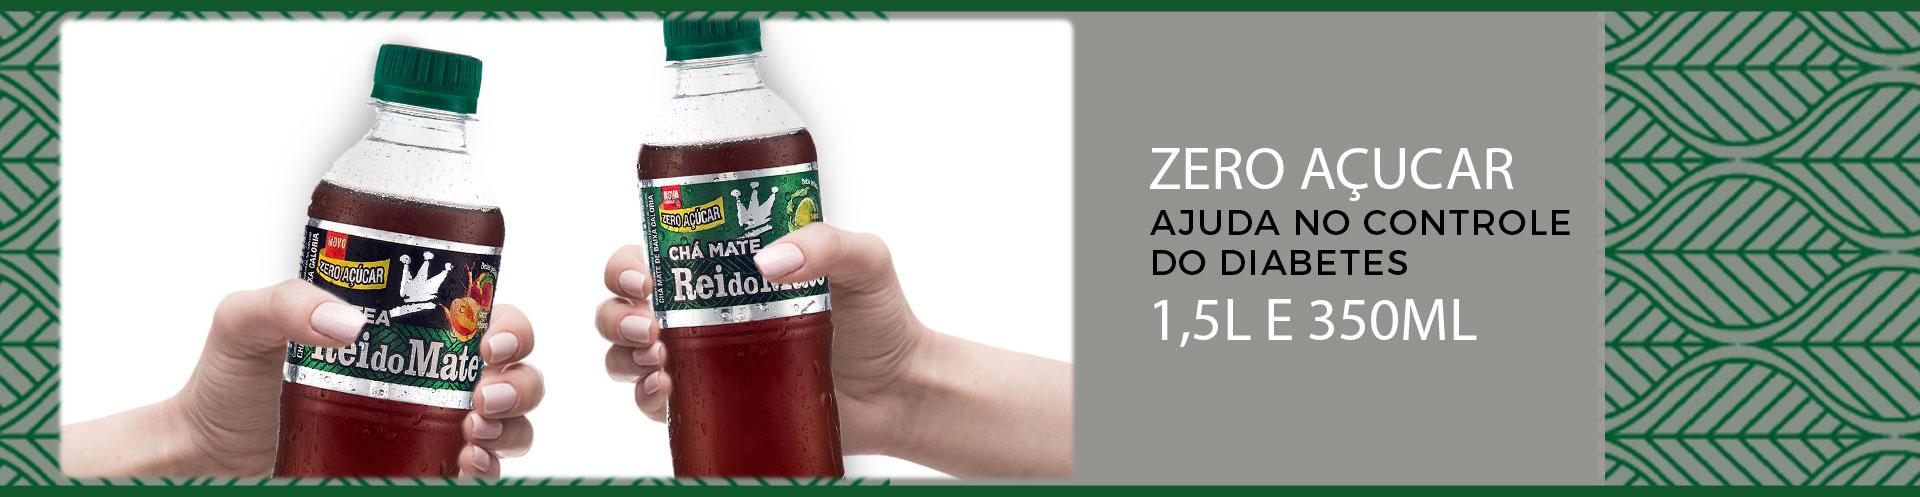 Zero Açúcar Full Banner